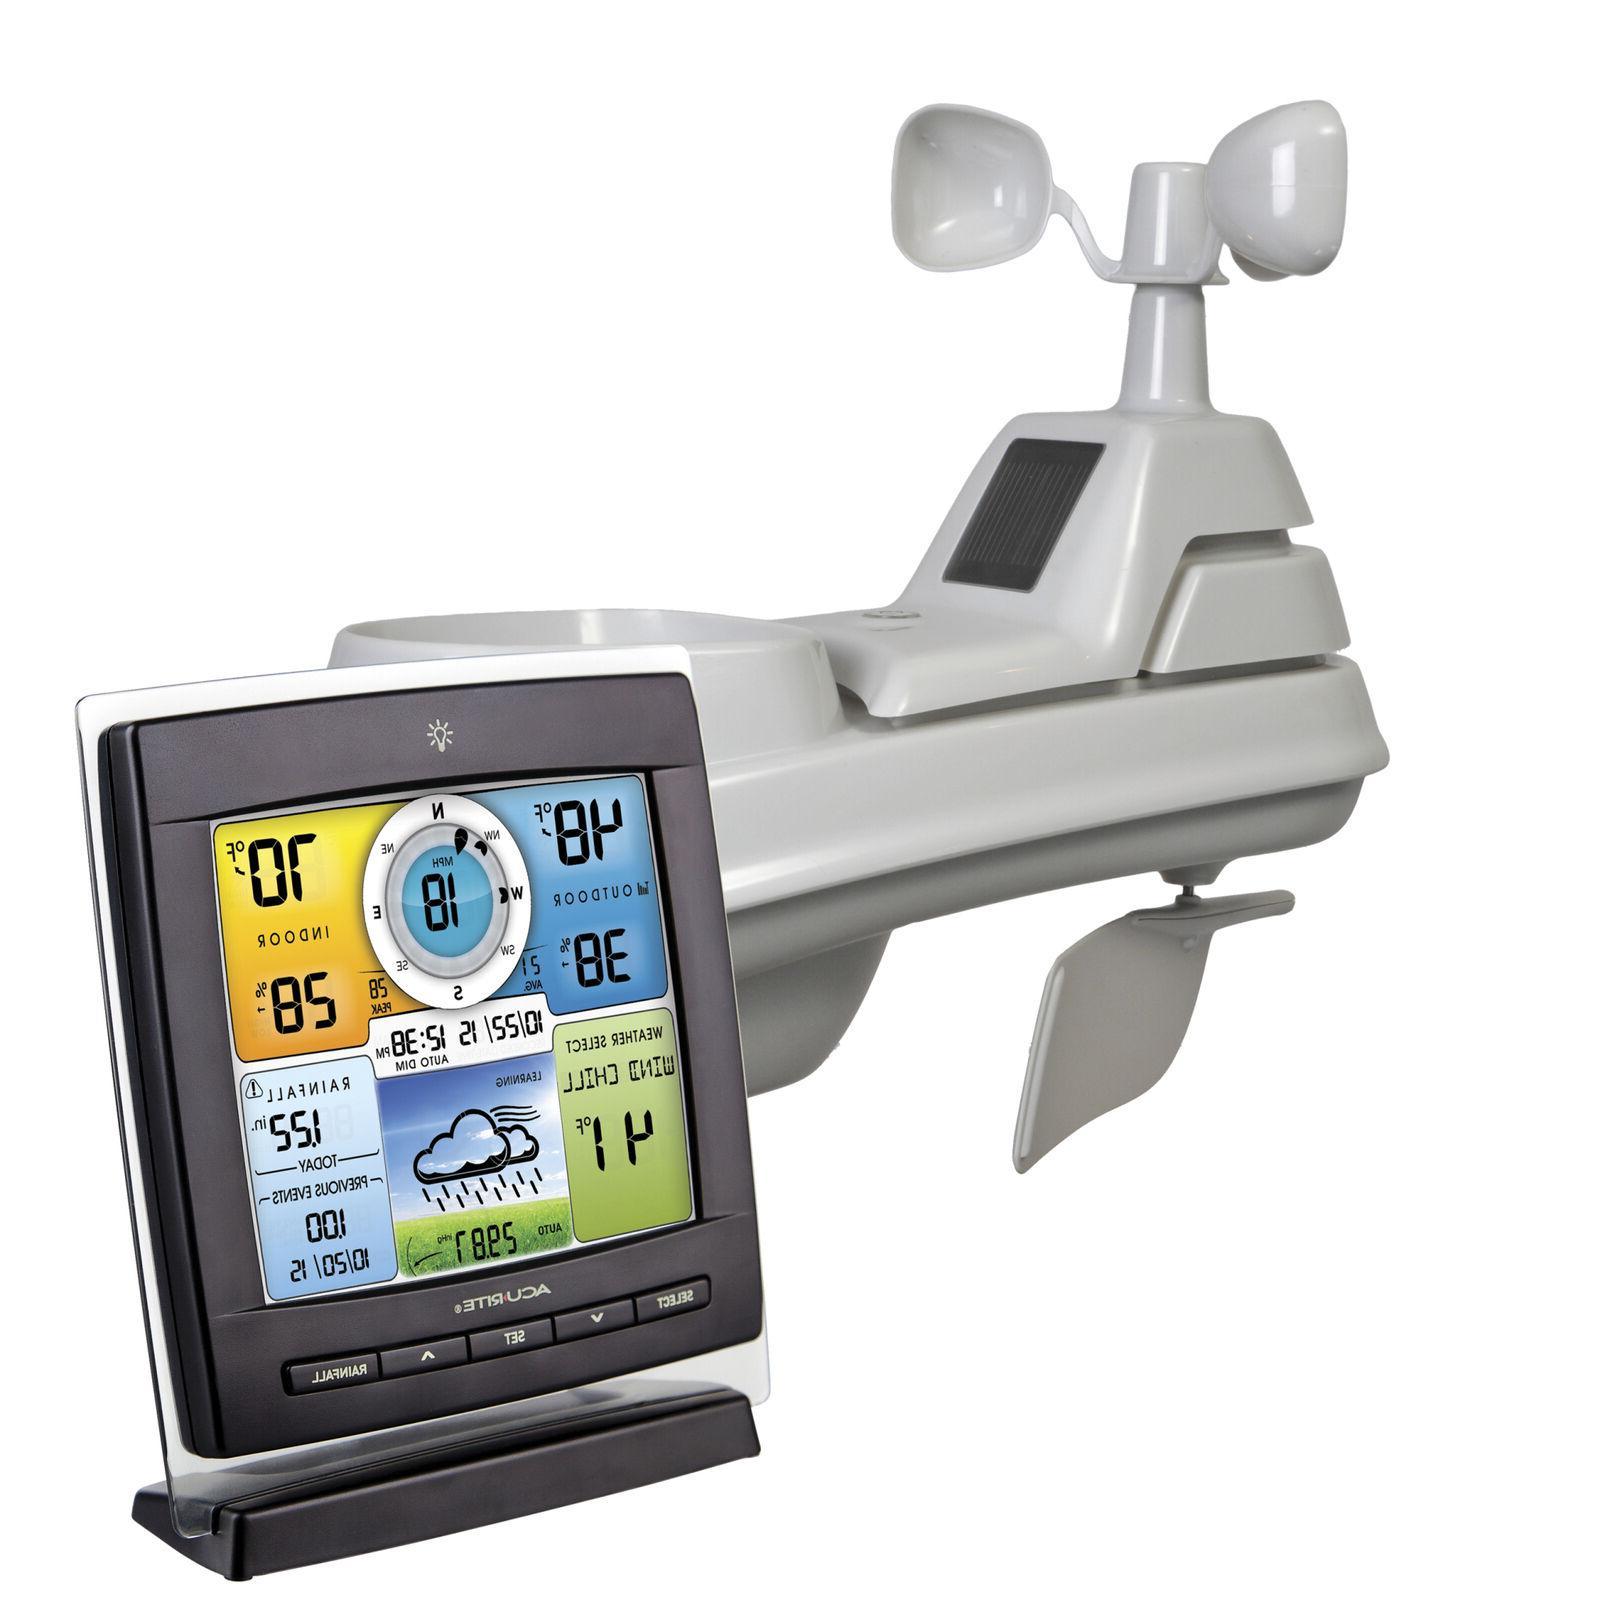 Wireless Weather Station W/ 5-in-1 Sensor 12-24 hr Self-Cali